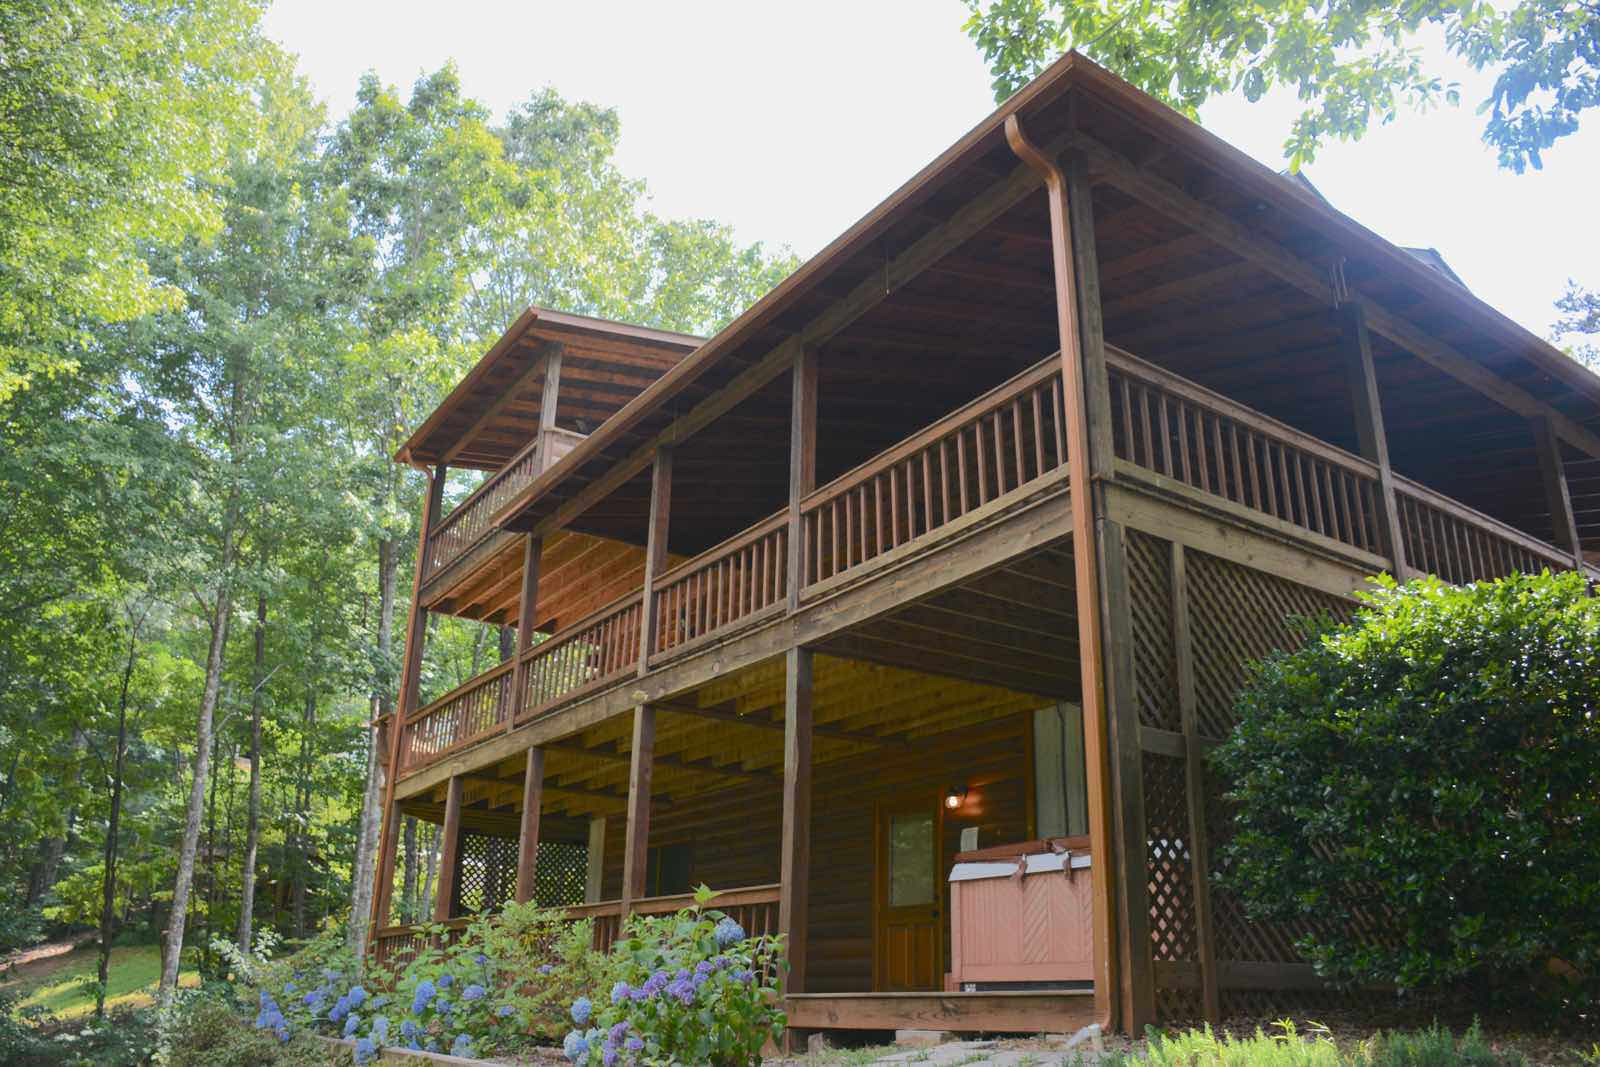 Blue ridge treasure rental cabin blue ridge ga for Rental cabins in ga